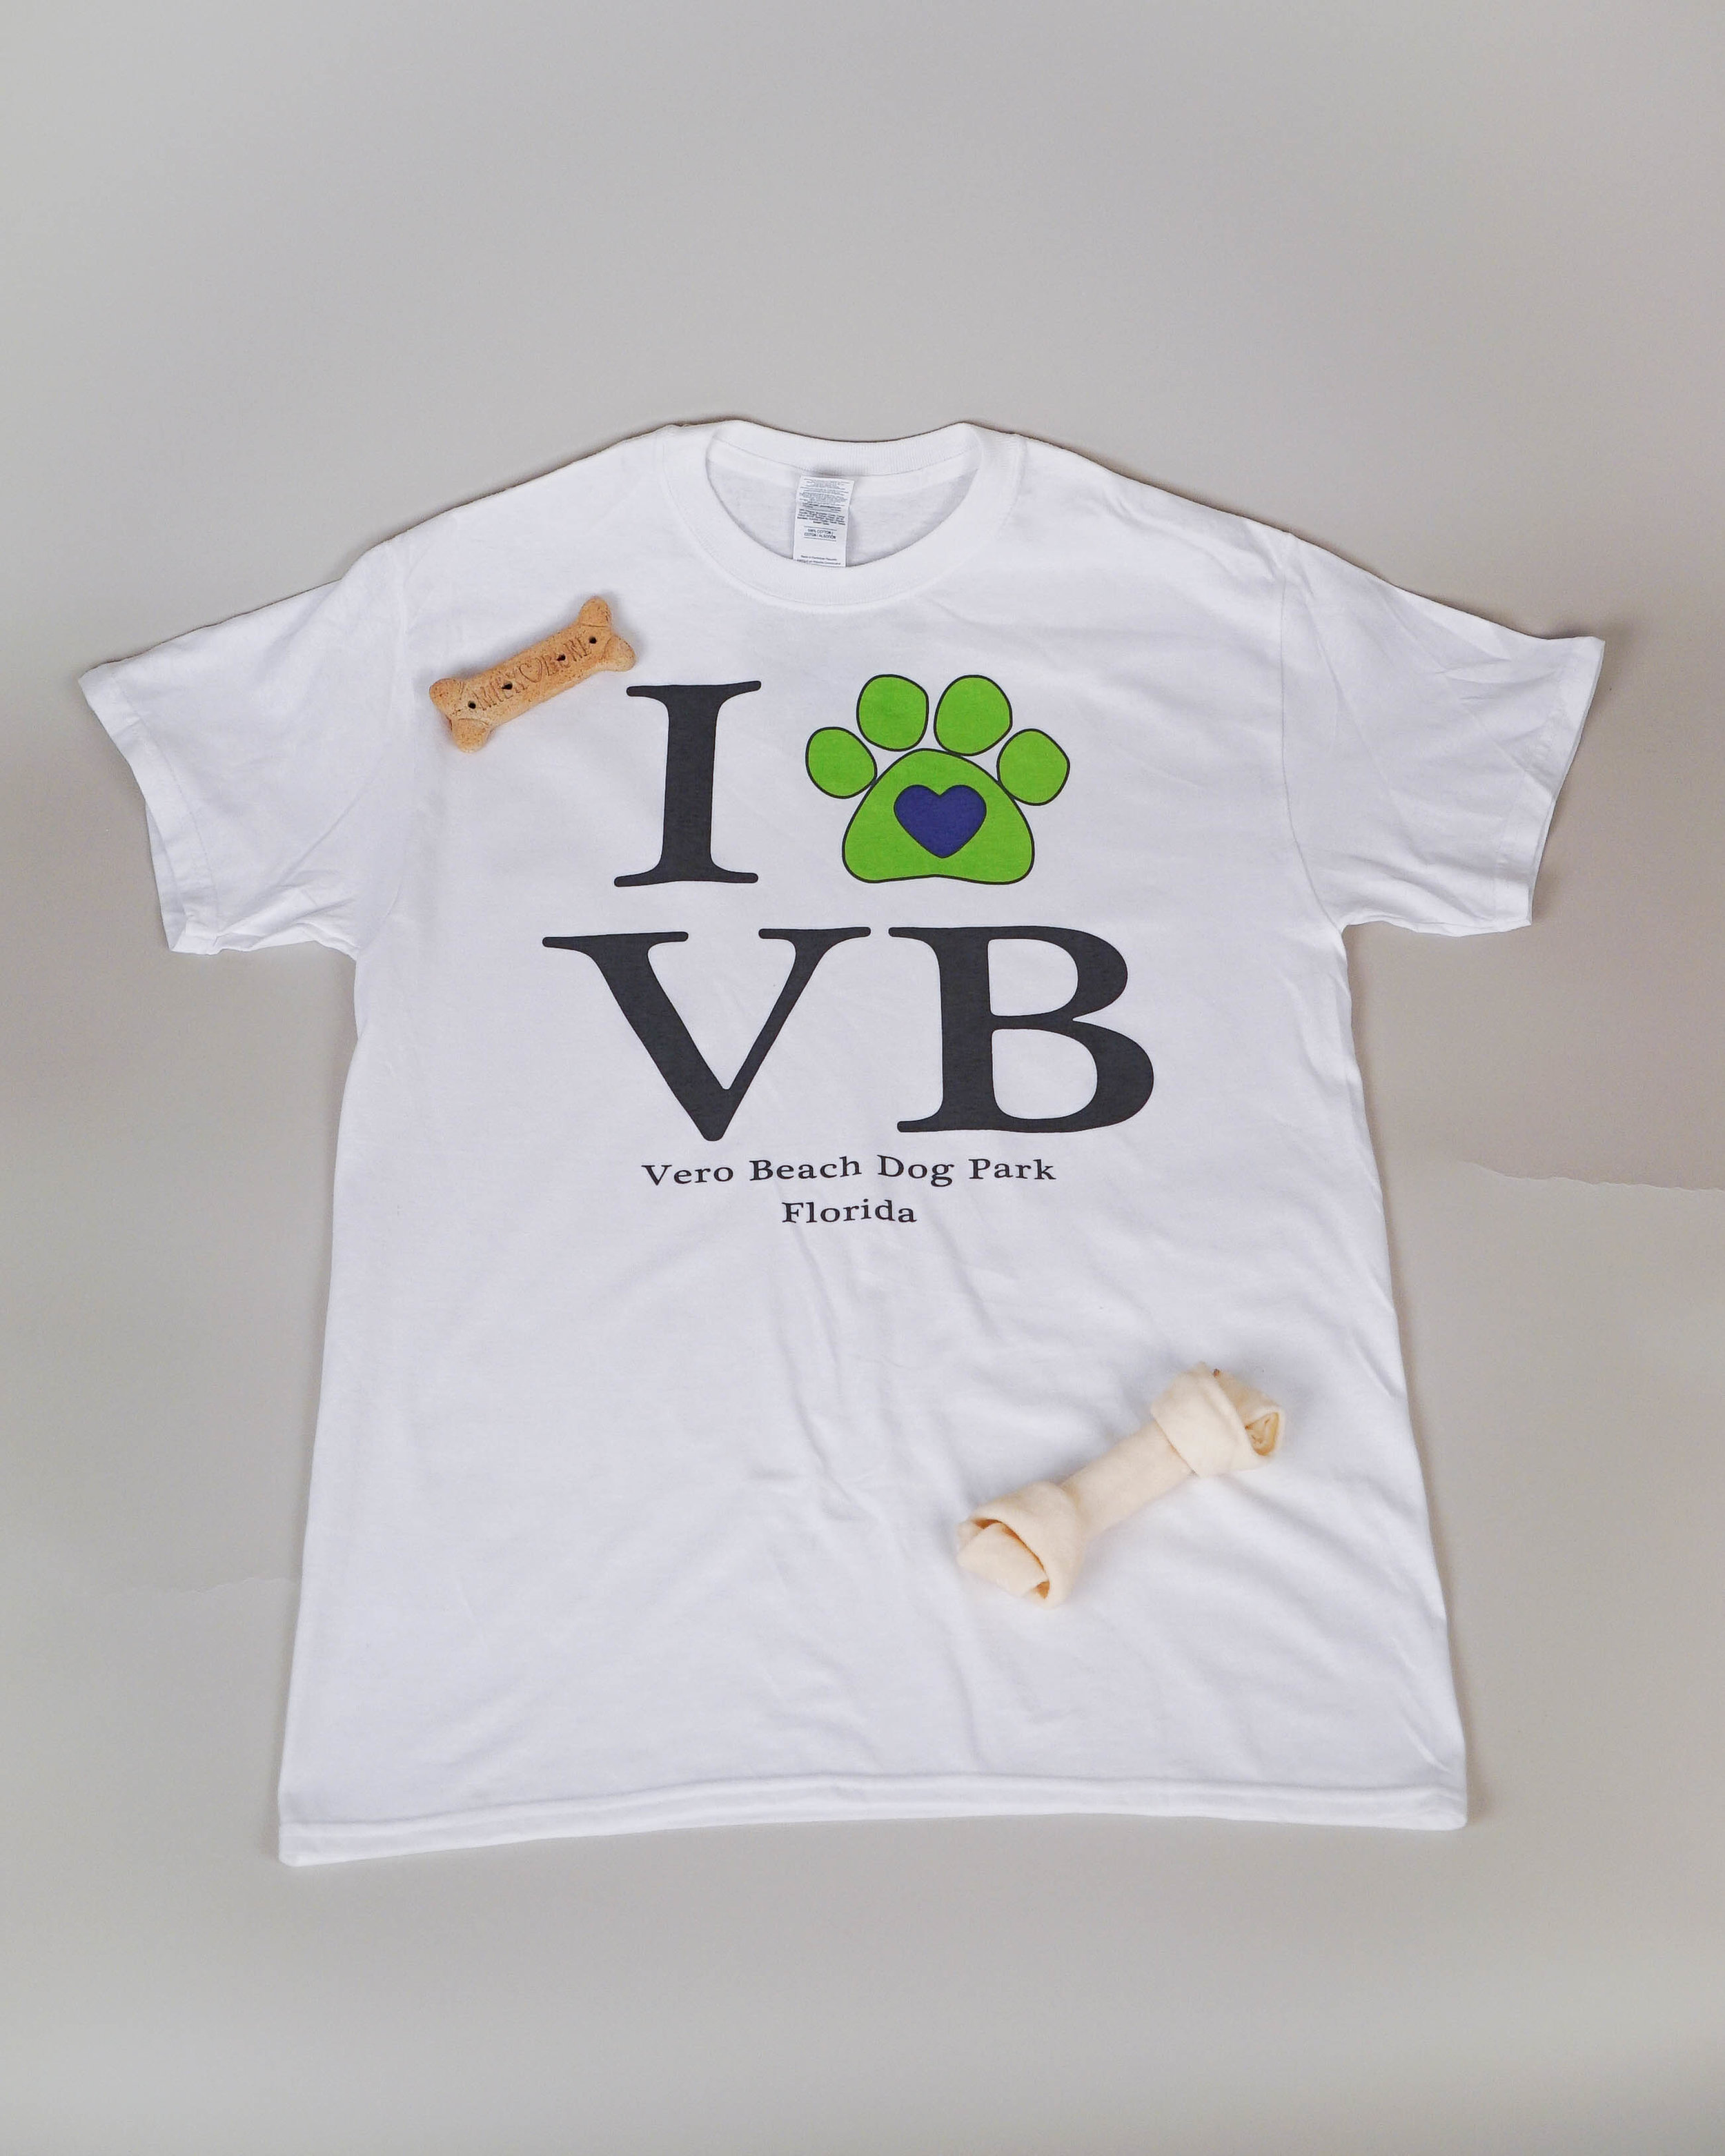 VBDP_product-14.jpg